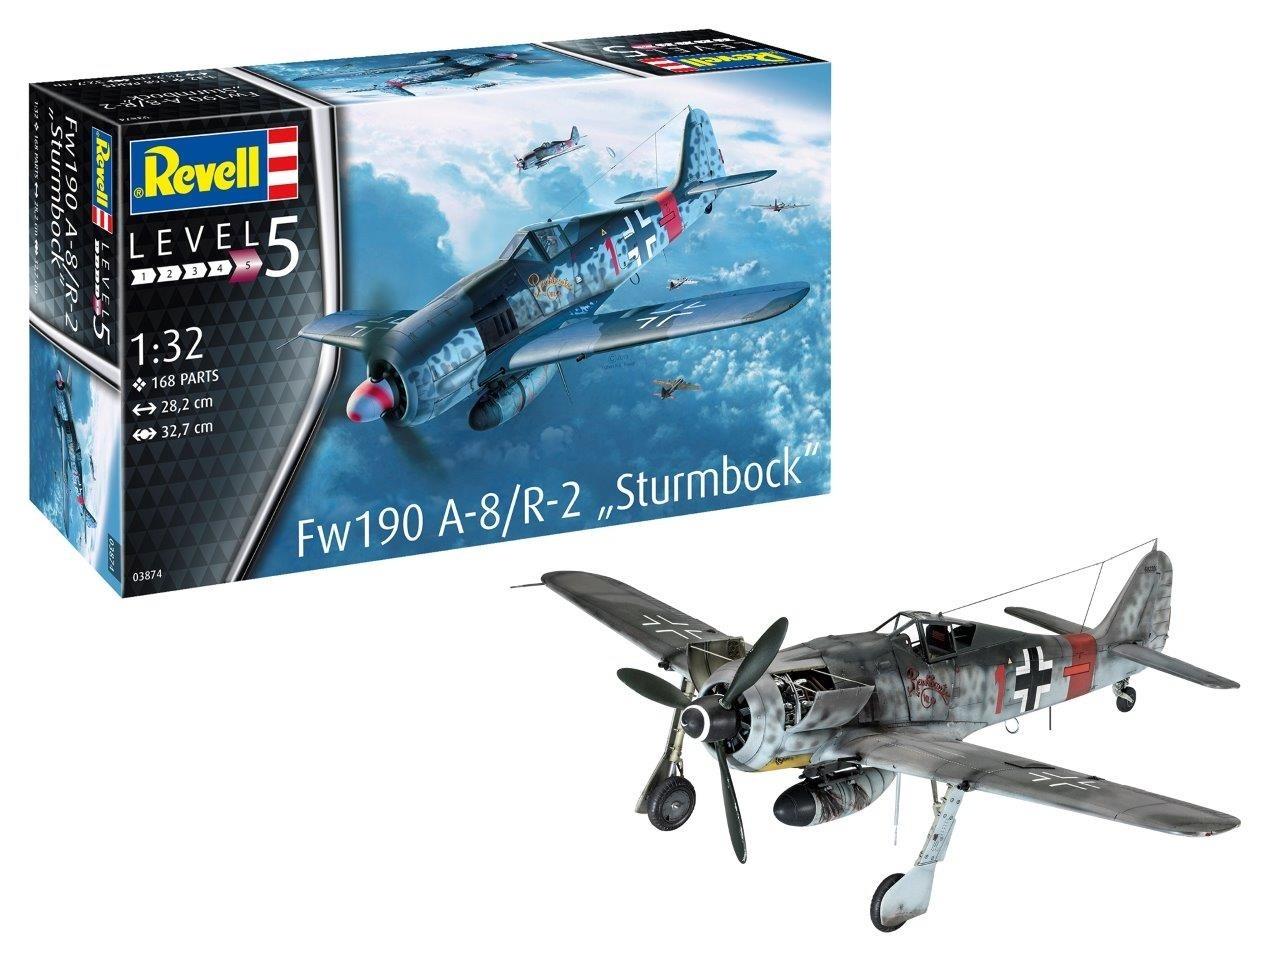 Fw190A-8/R-2 Sturmbock